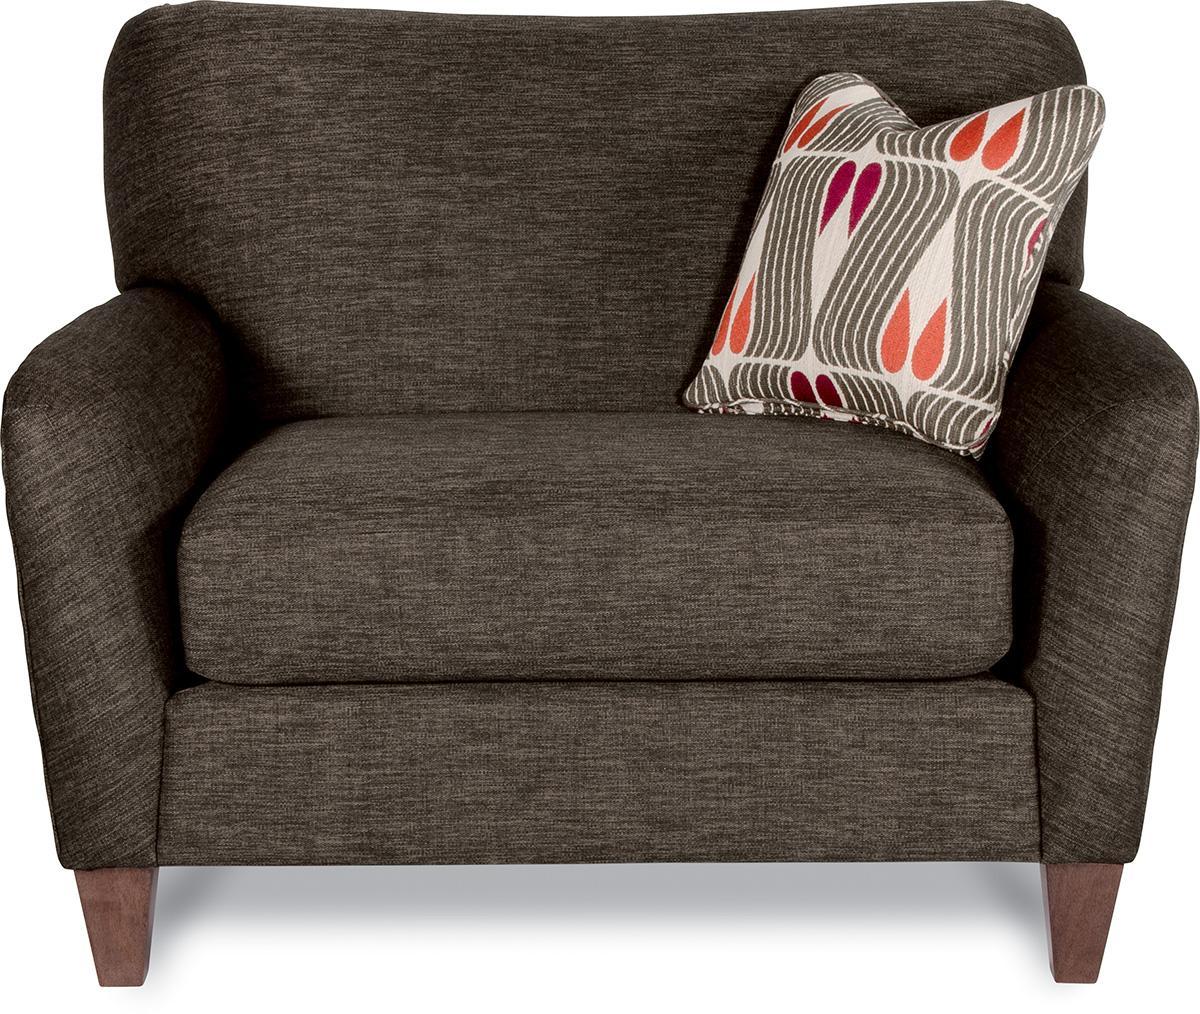 La-Z-Boy Marley Premier Chair-and-a-Half - Item Number: 655623C117555